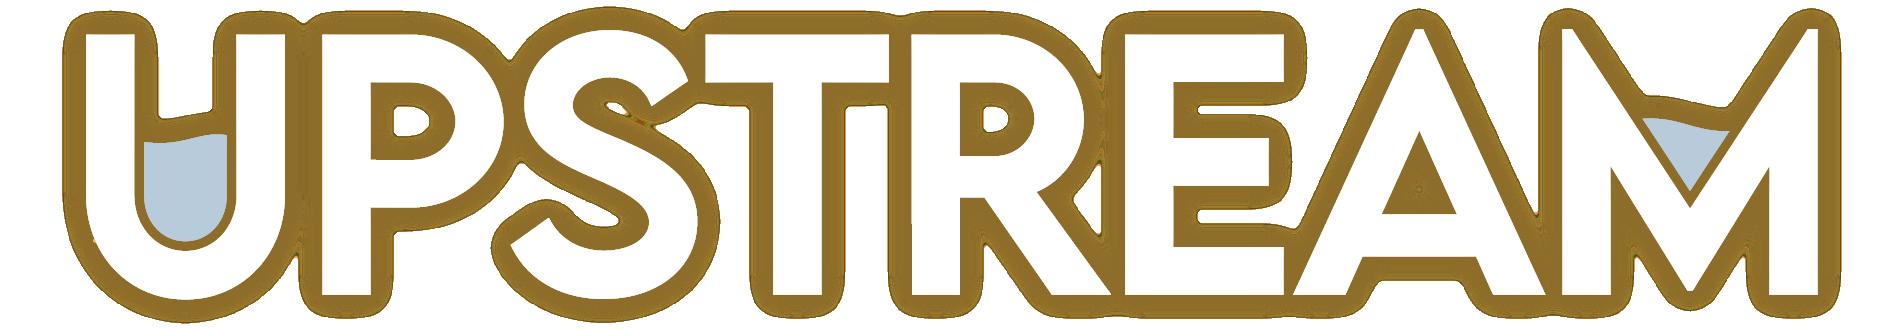 Upstream - Logo